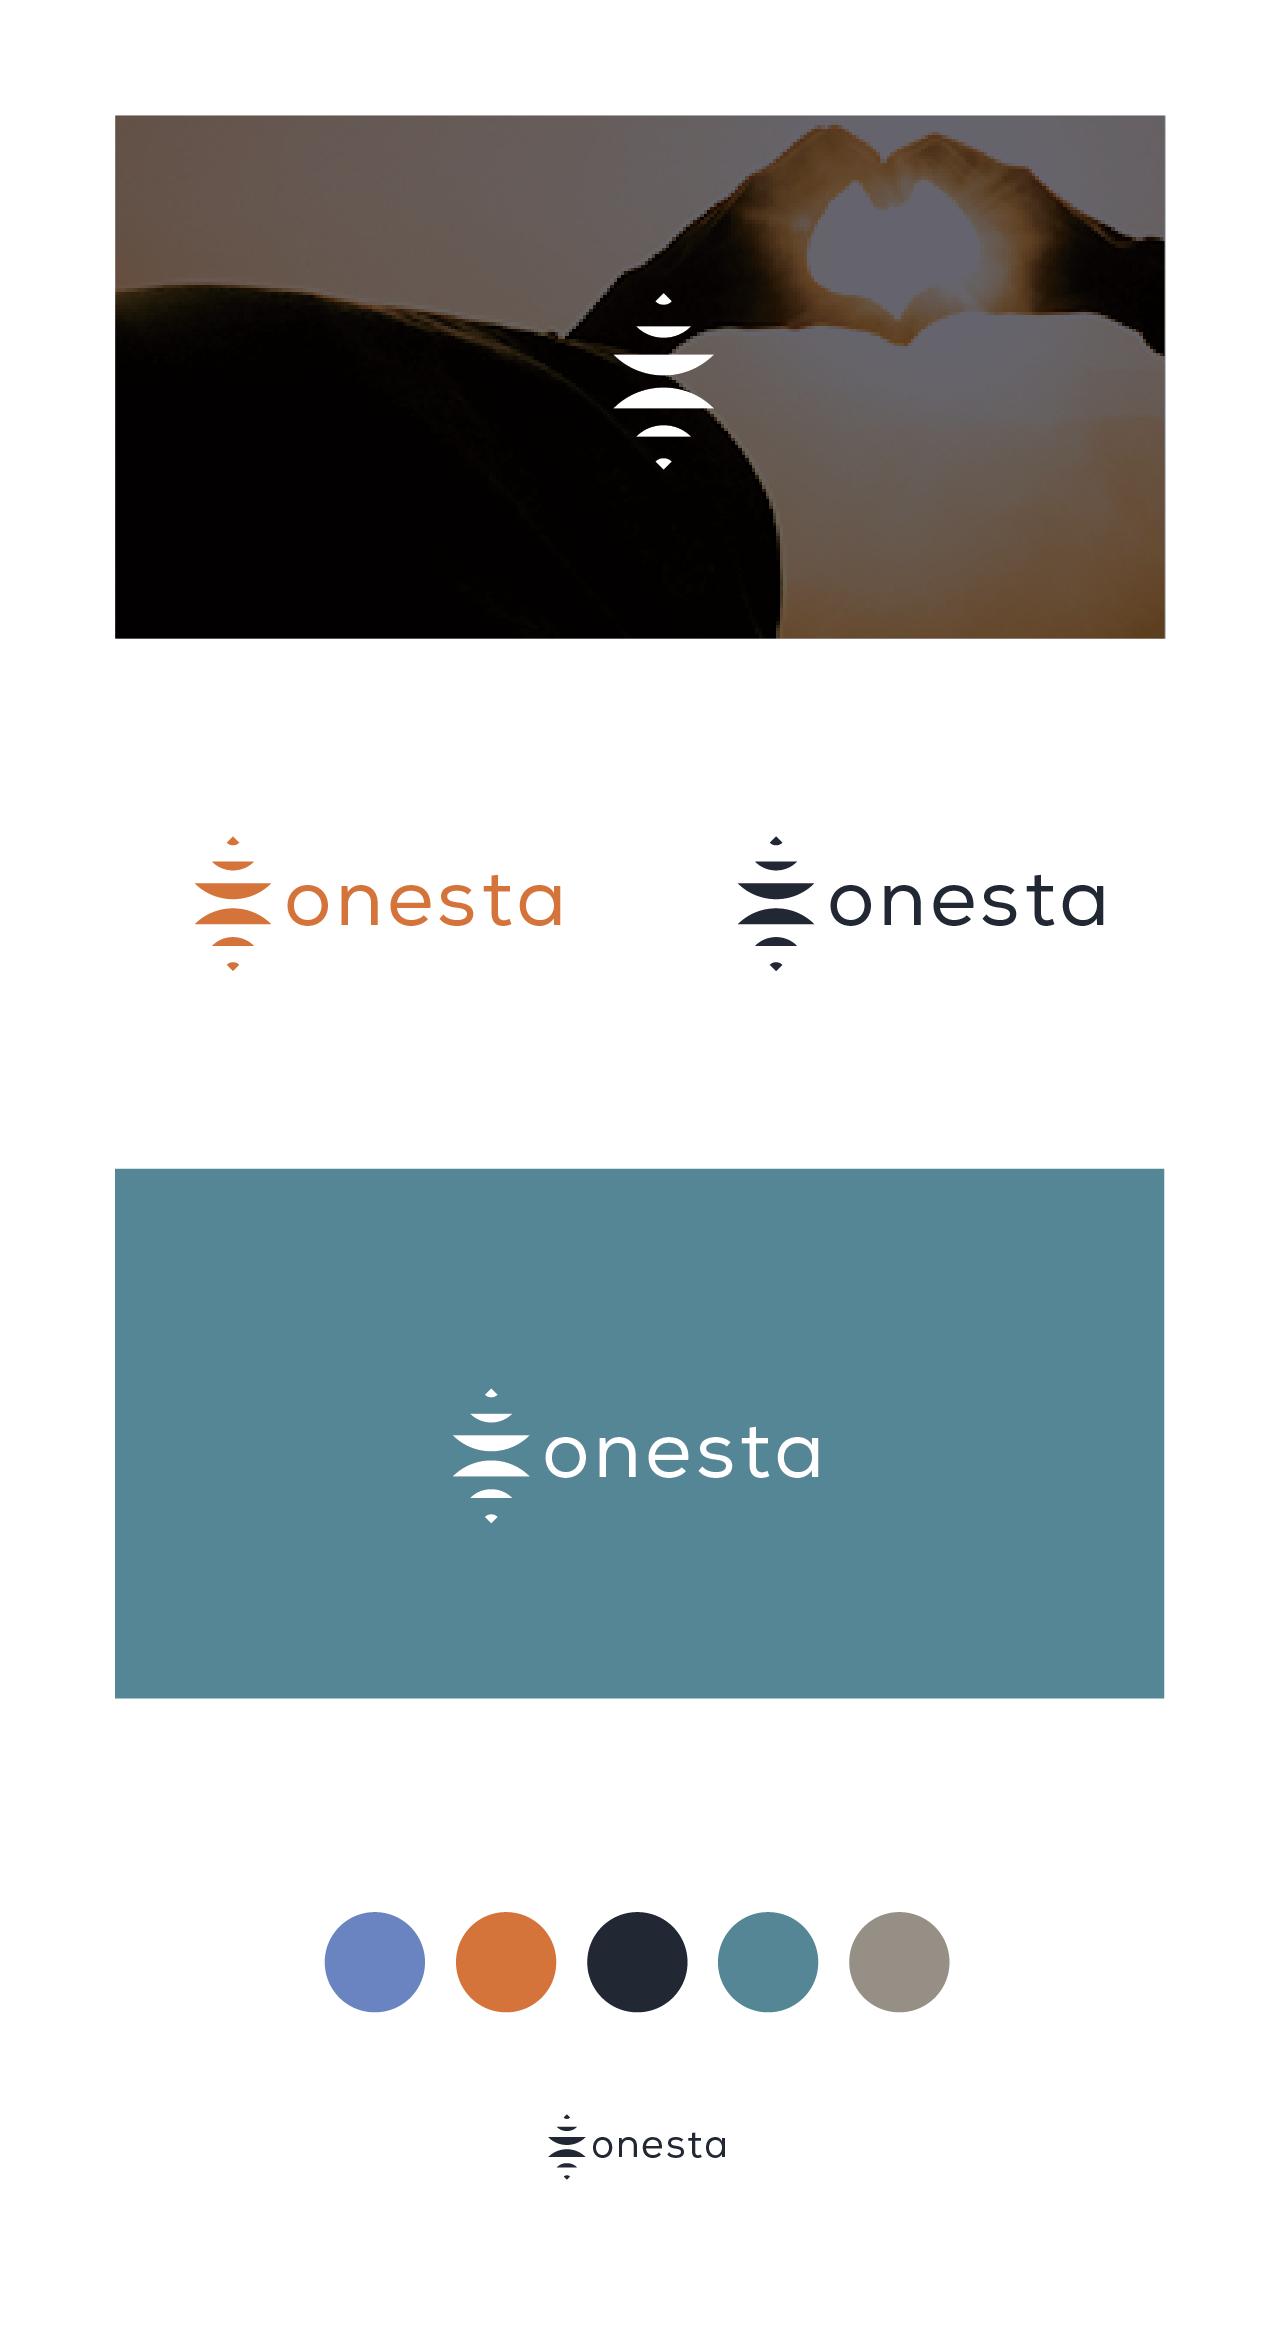 Onesta_Logos_Rnd1_v02.png